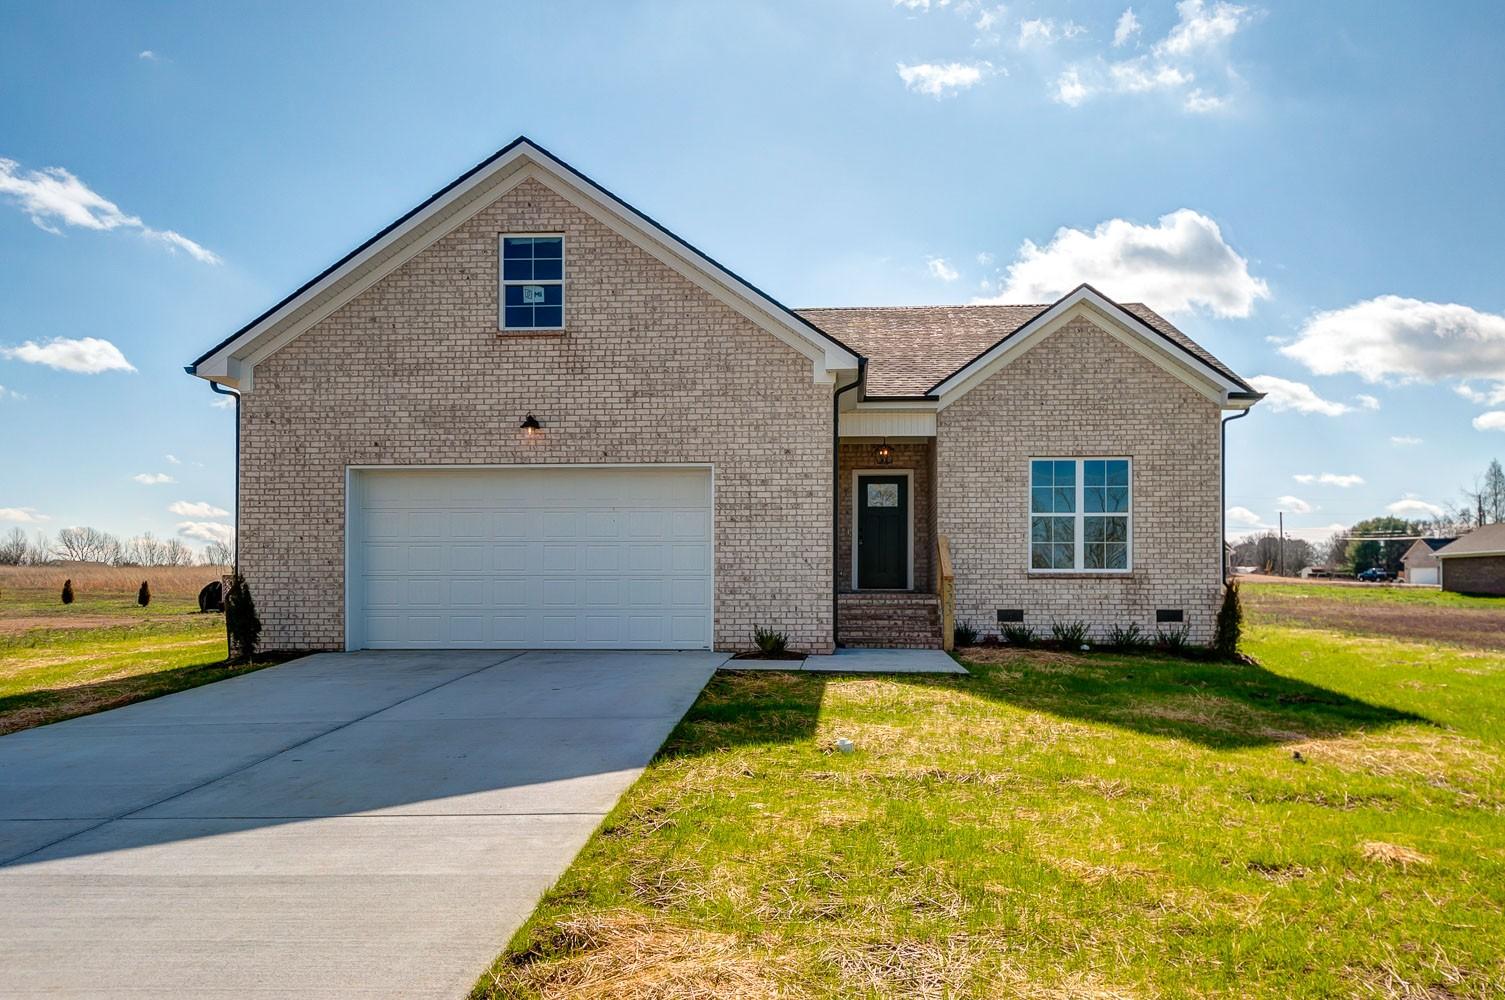 523 Brookside Dr, Mount Pleasant, TN 38474 - Mount Pleasant, TN real estate listing